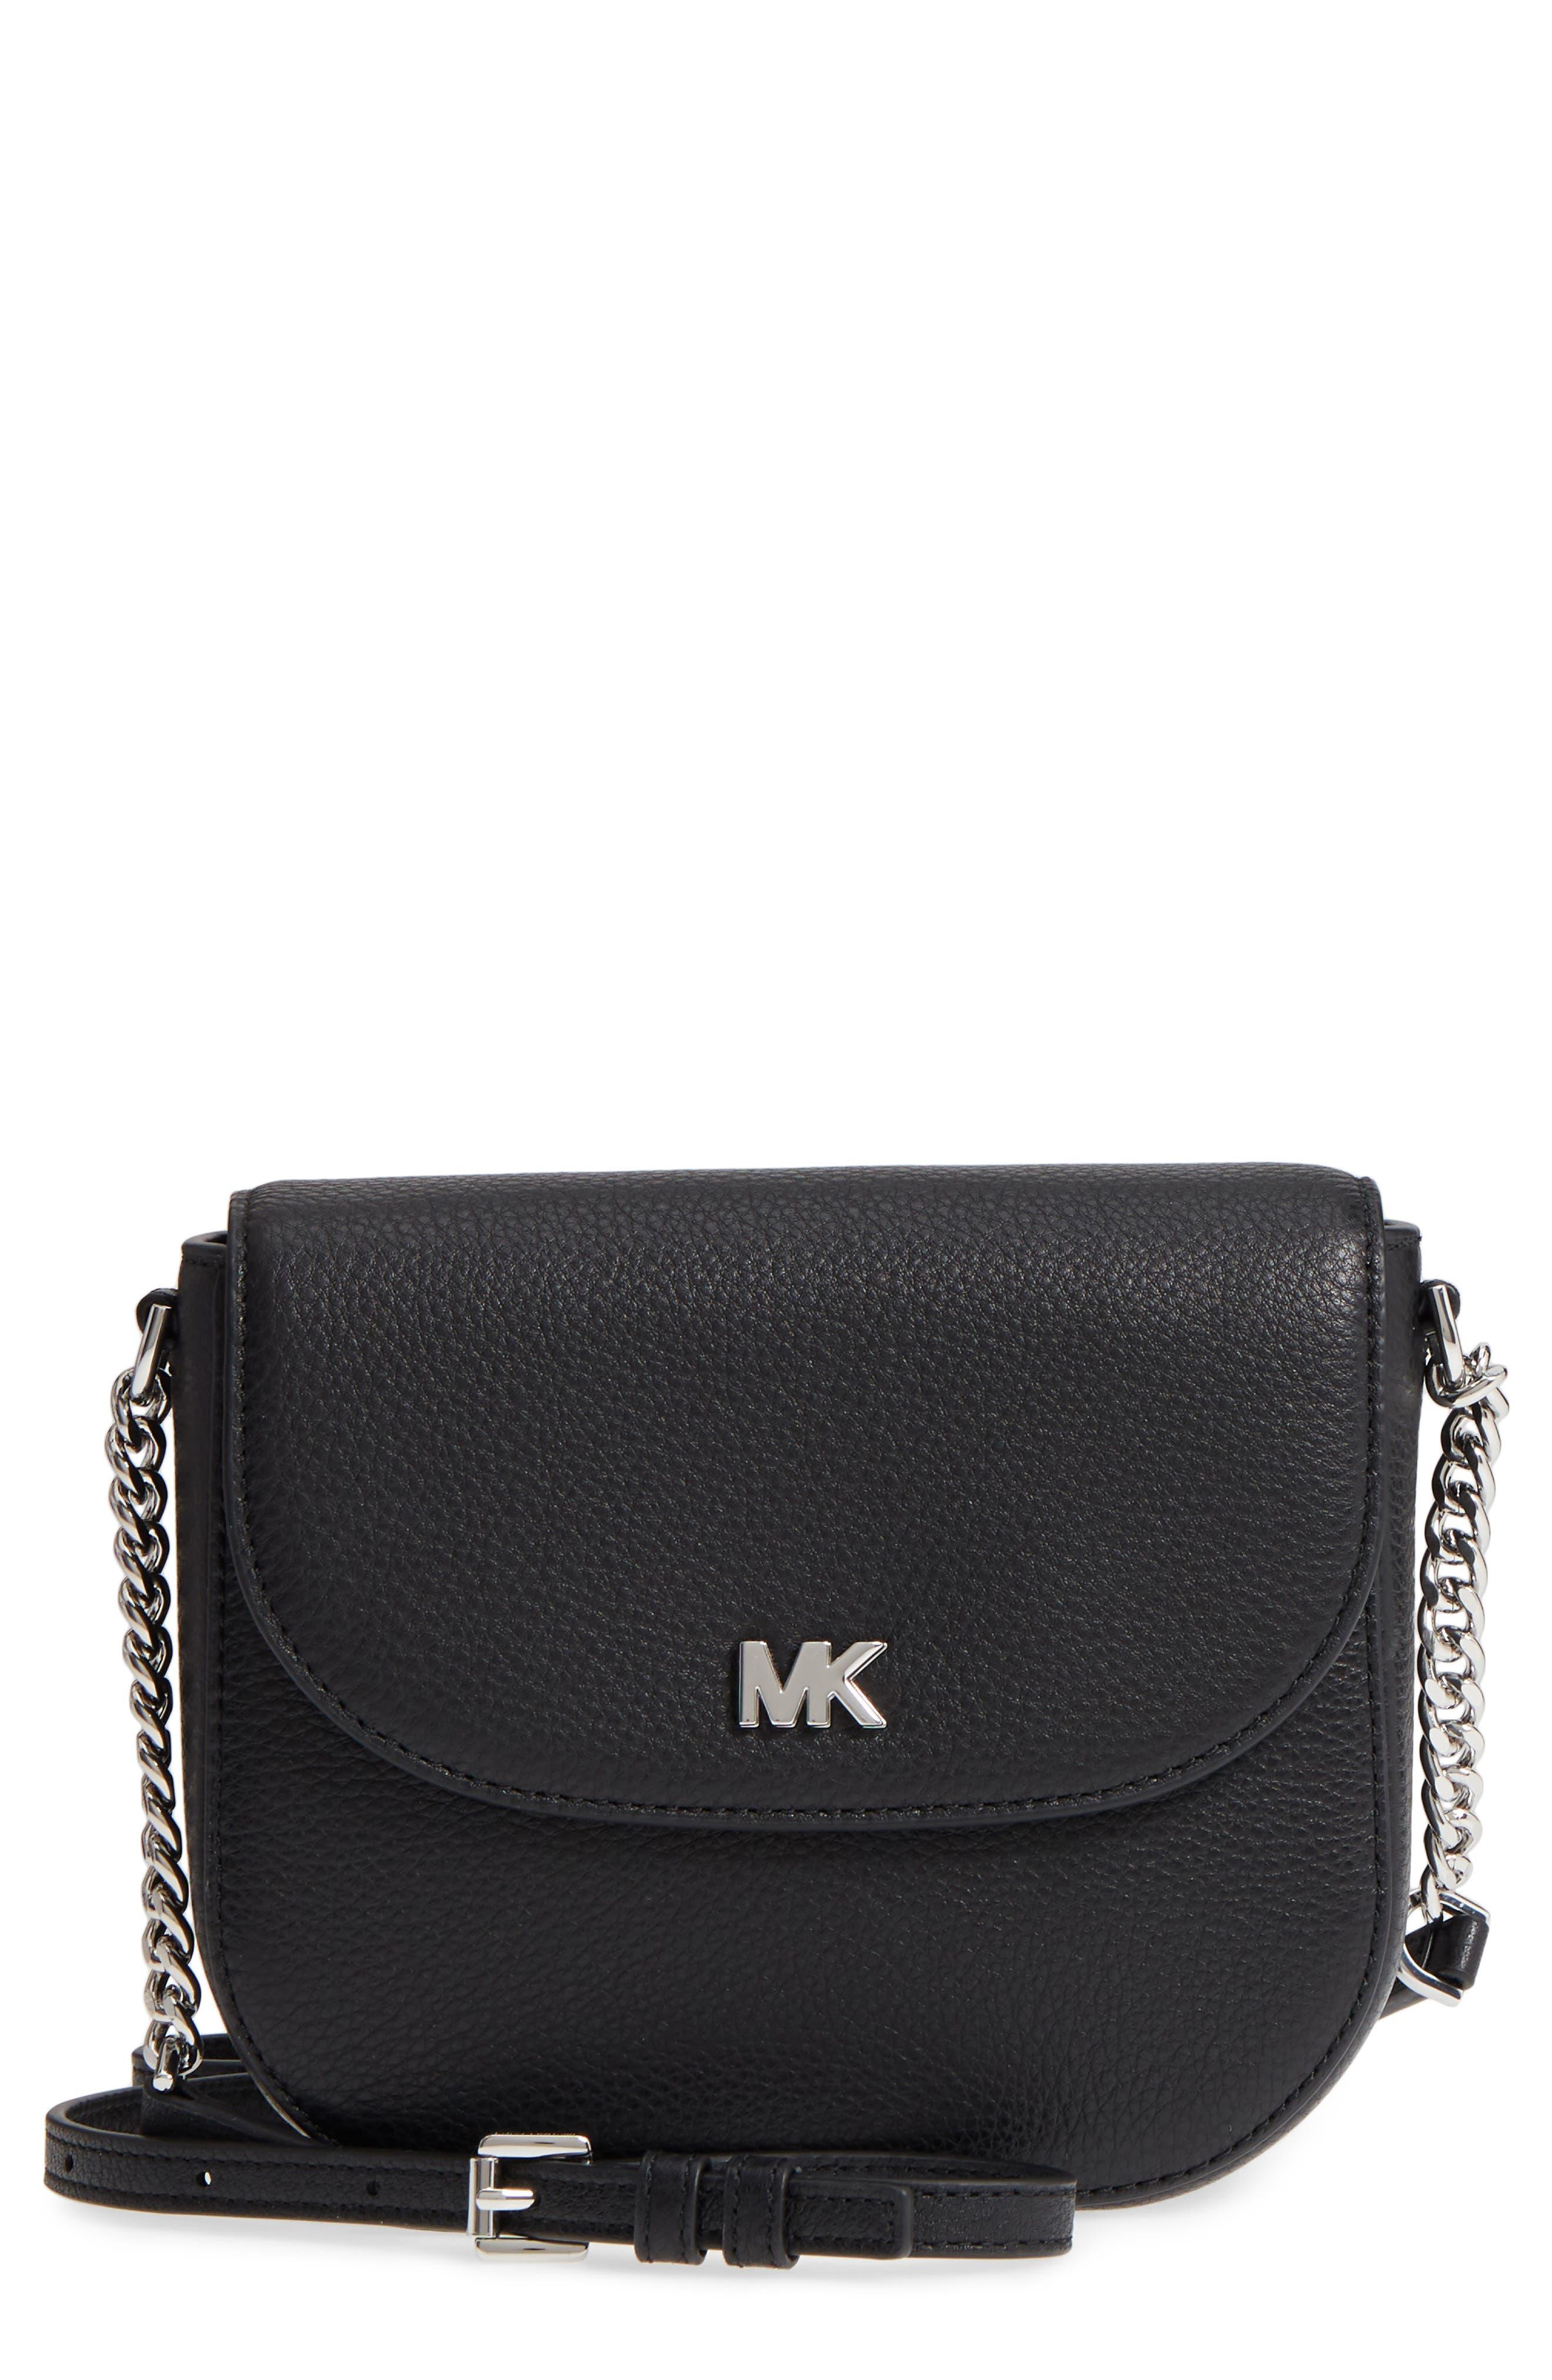 MICHAEL Michael Kors Mott Leather Crossbody Bag